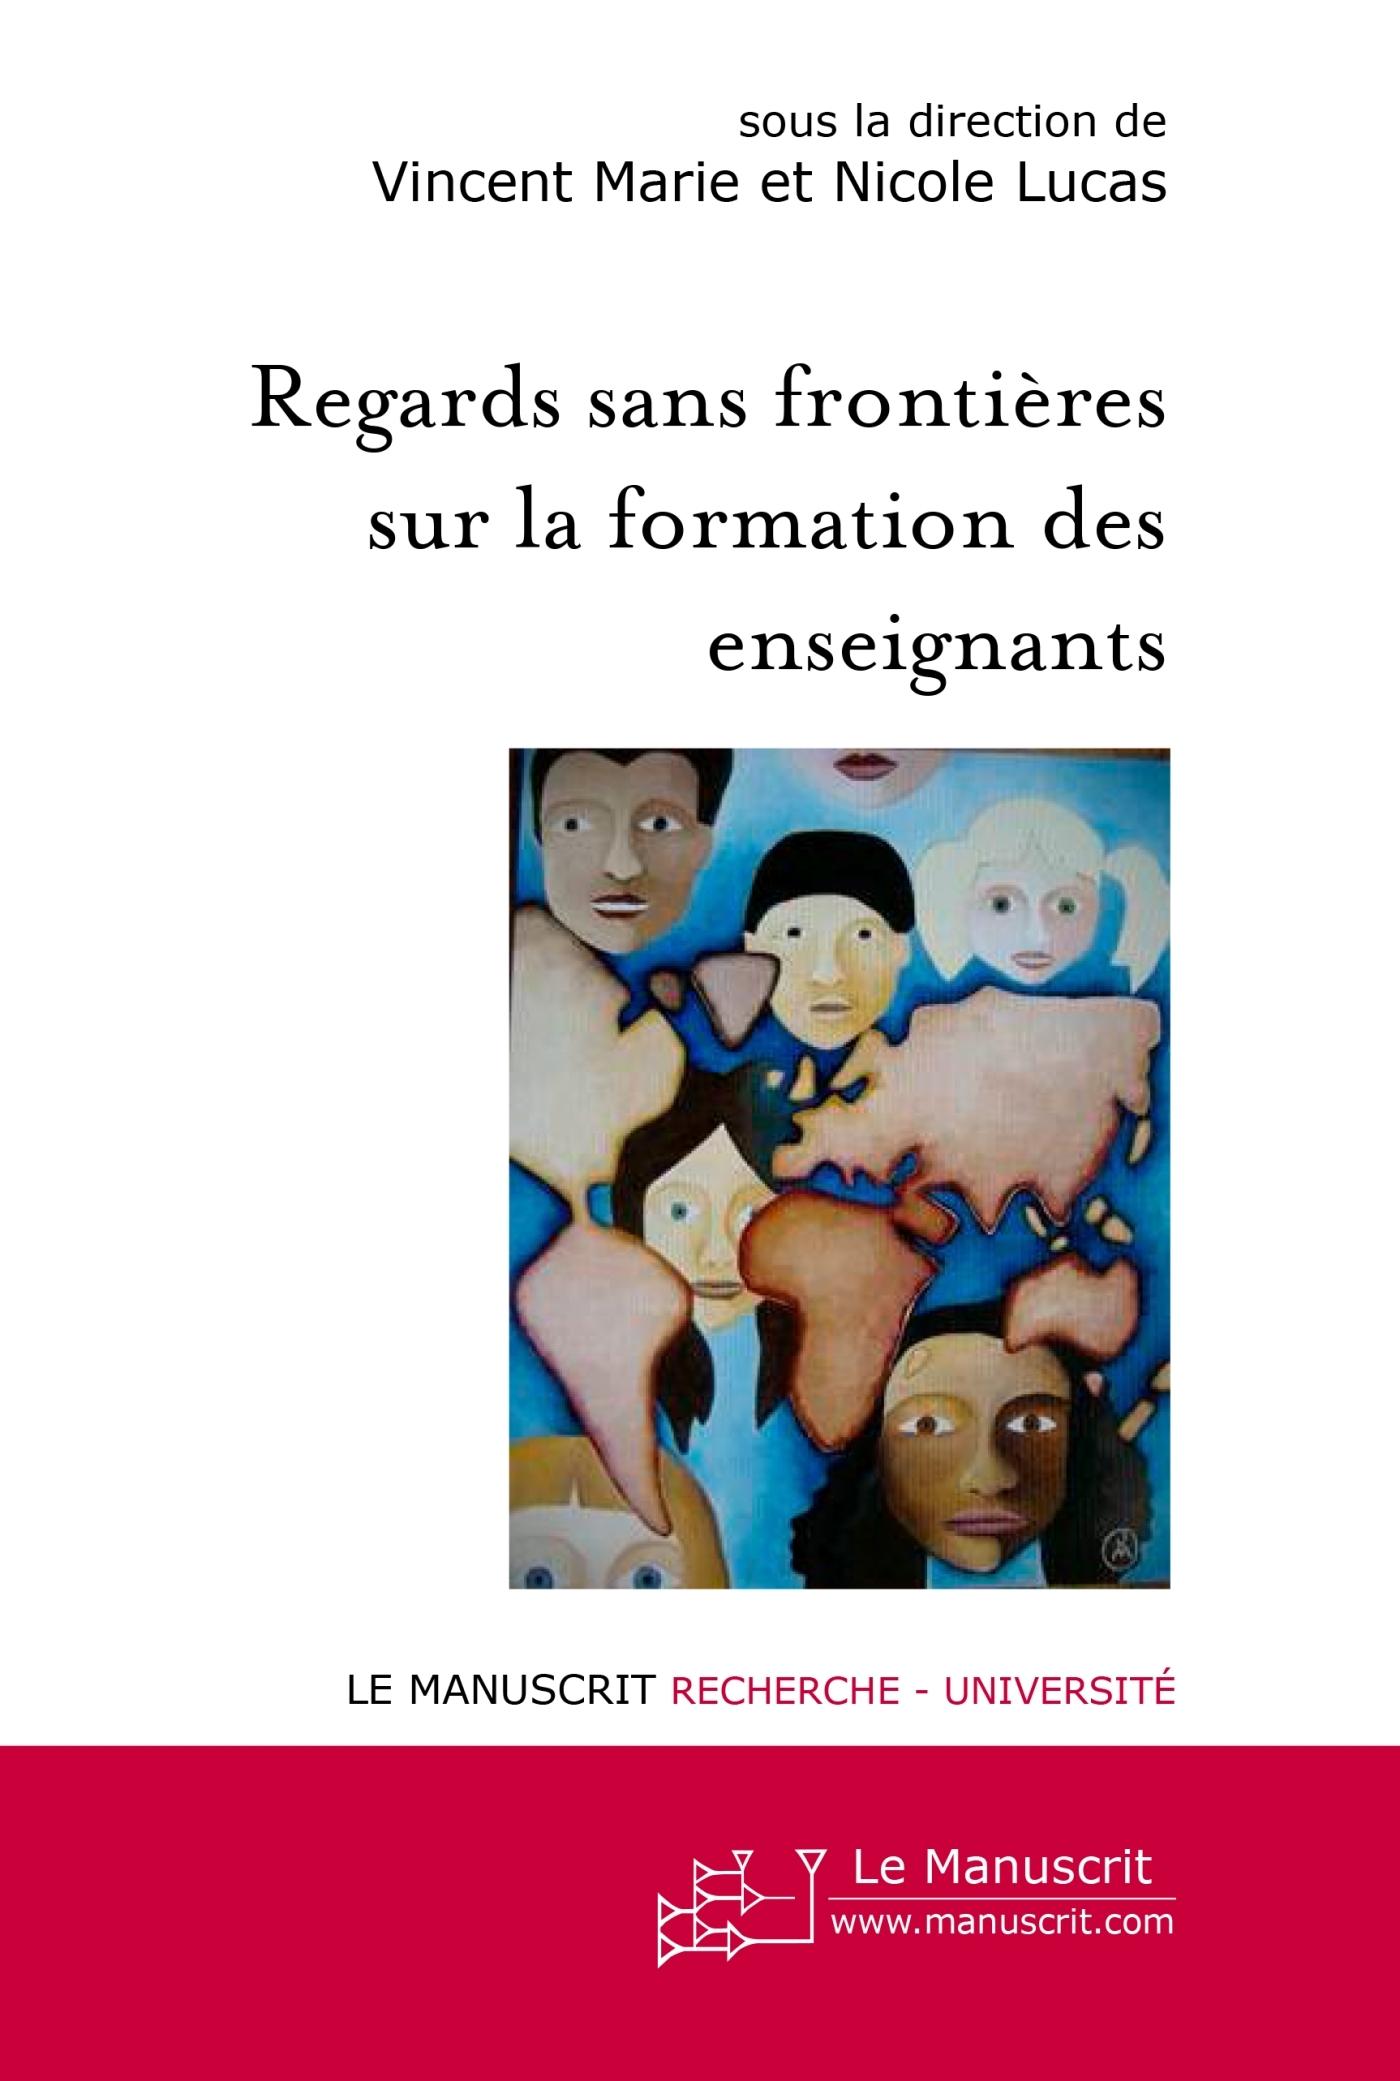 REGARDS SANS FRONTIERES SUR LA FORMATION DES ENSEIGNANTS